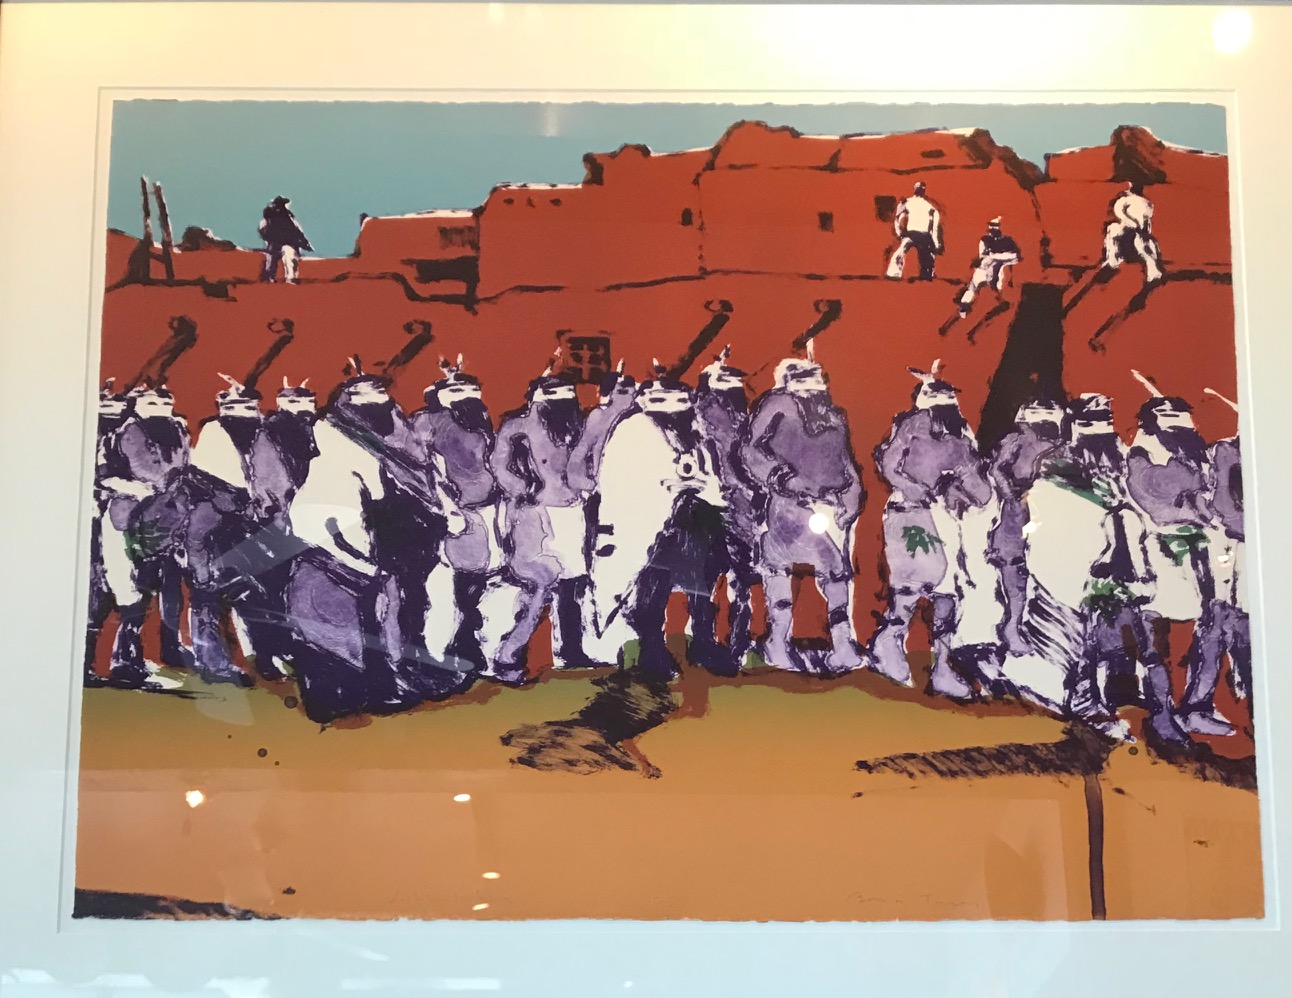 Dancers at Zuni, Scholder lithograph.